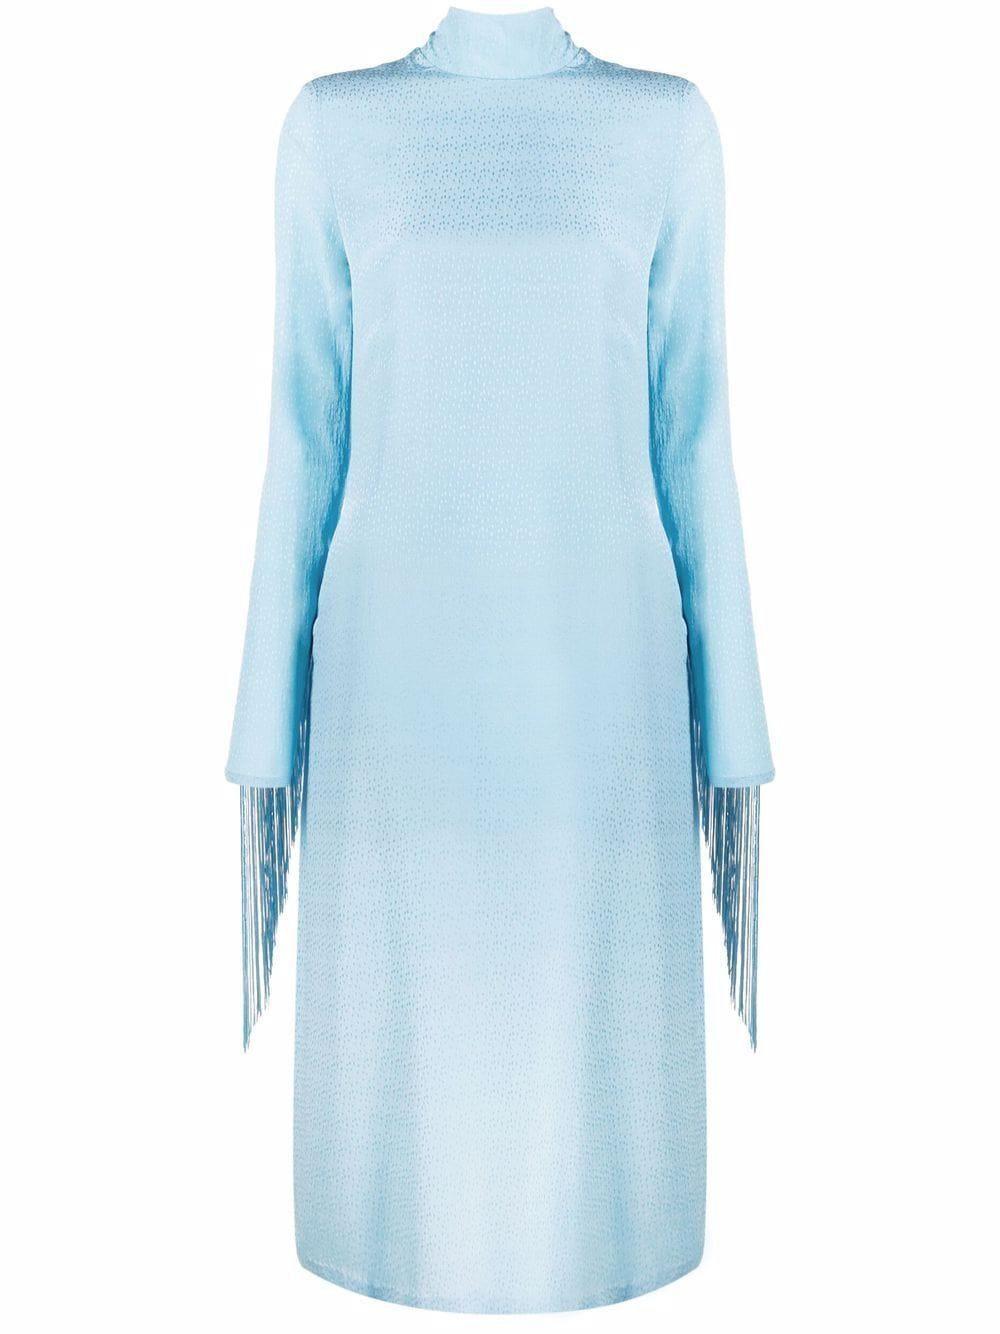 Reba Fringe Dress